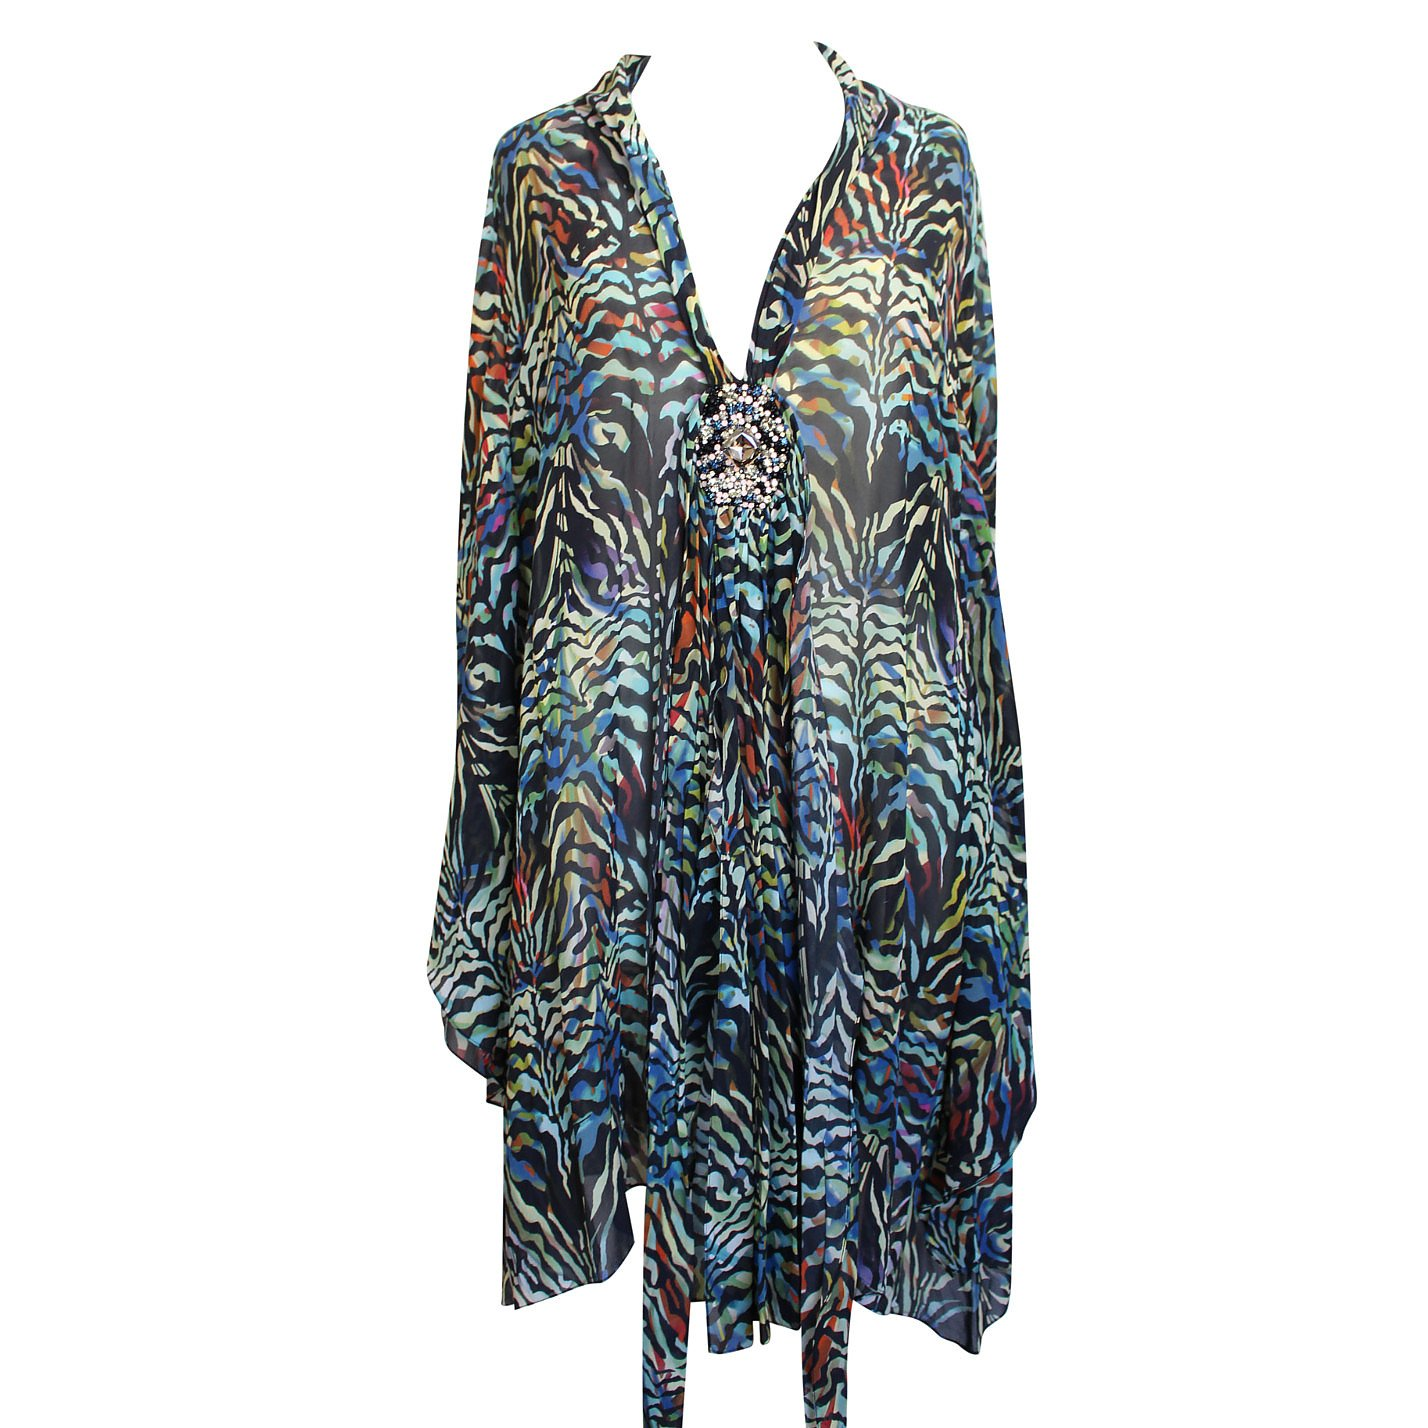 Matthew Williamson Sheer Multicolour Printed Dress